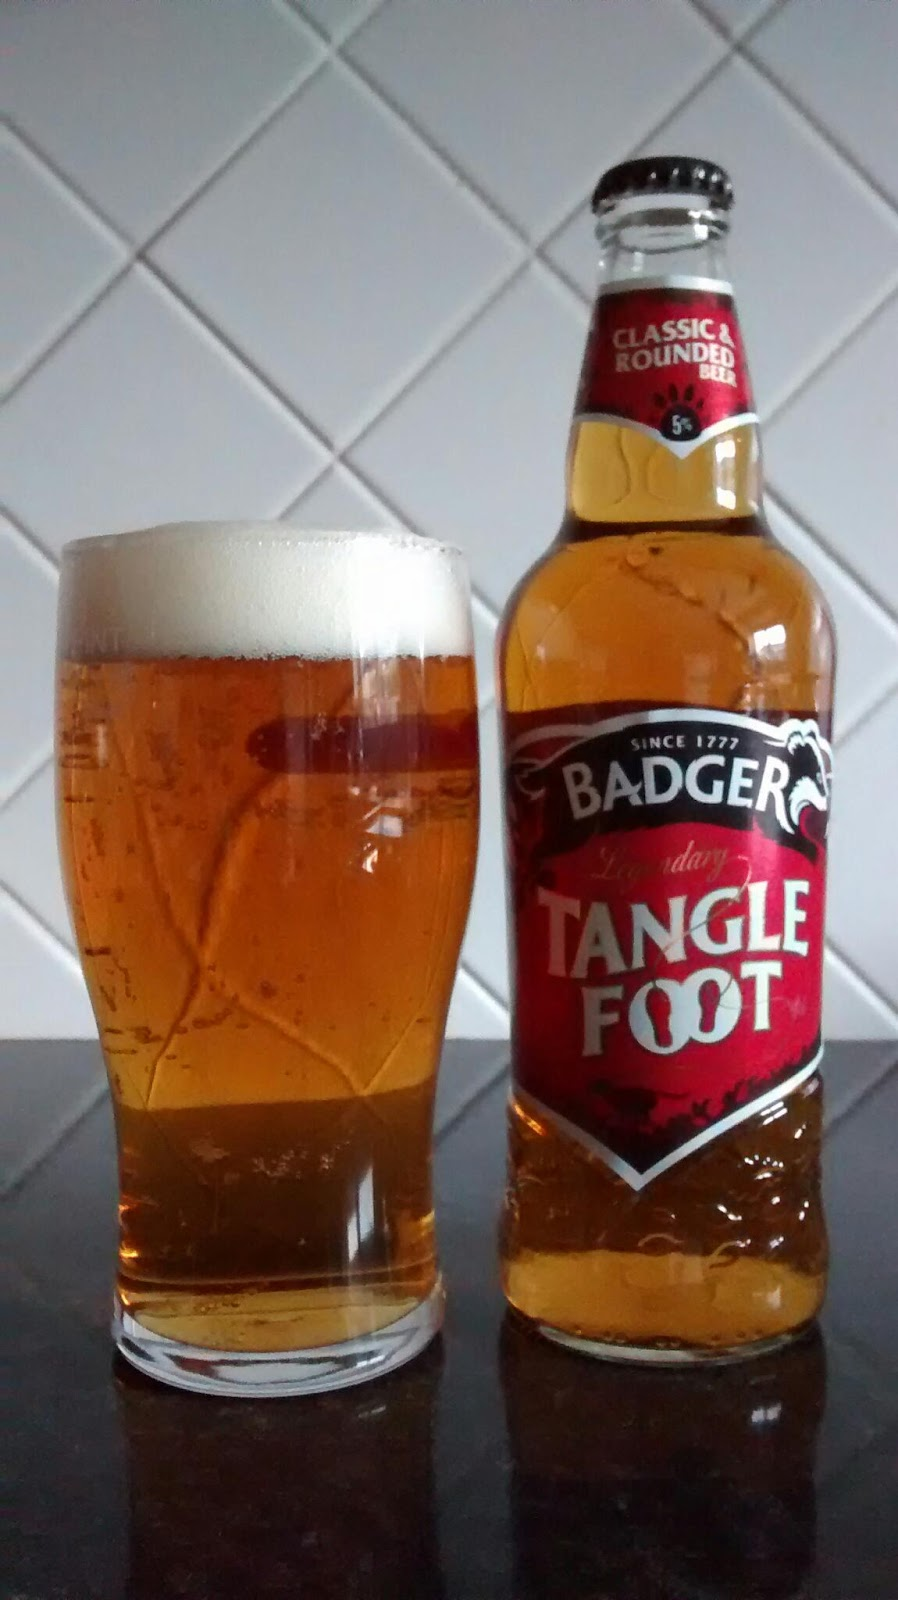 Badger Tanglefoot ในปี 2020